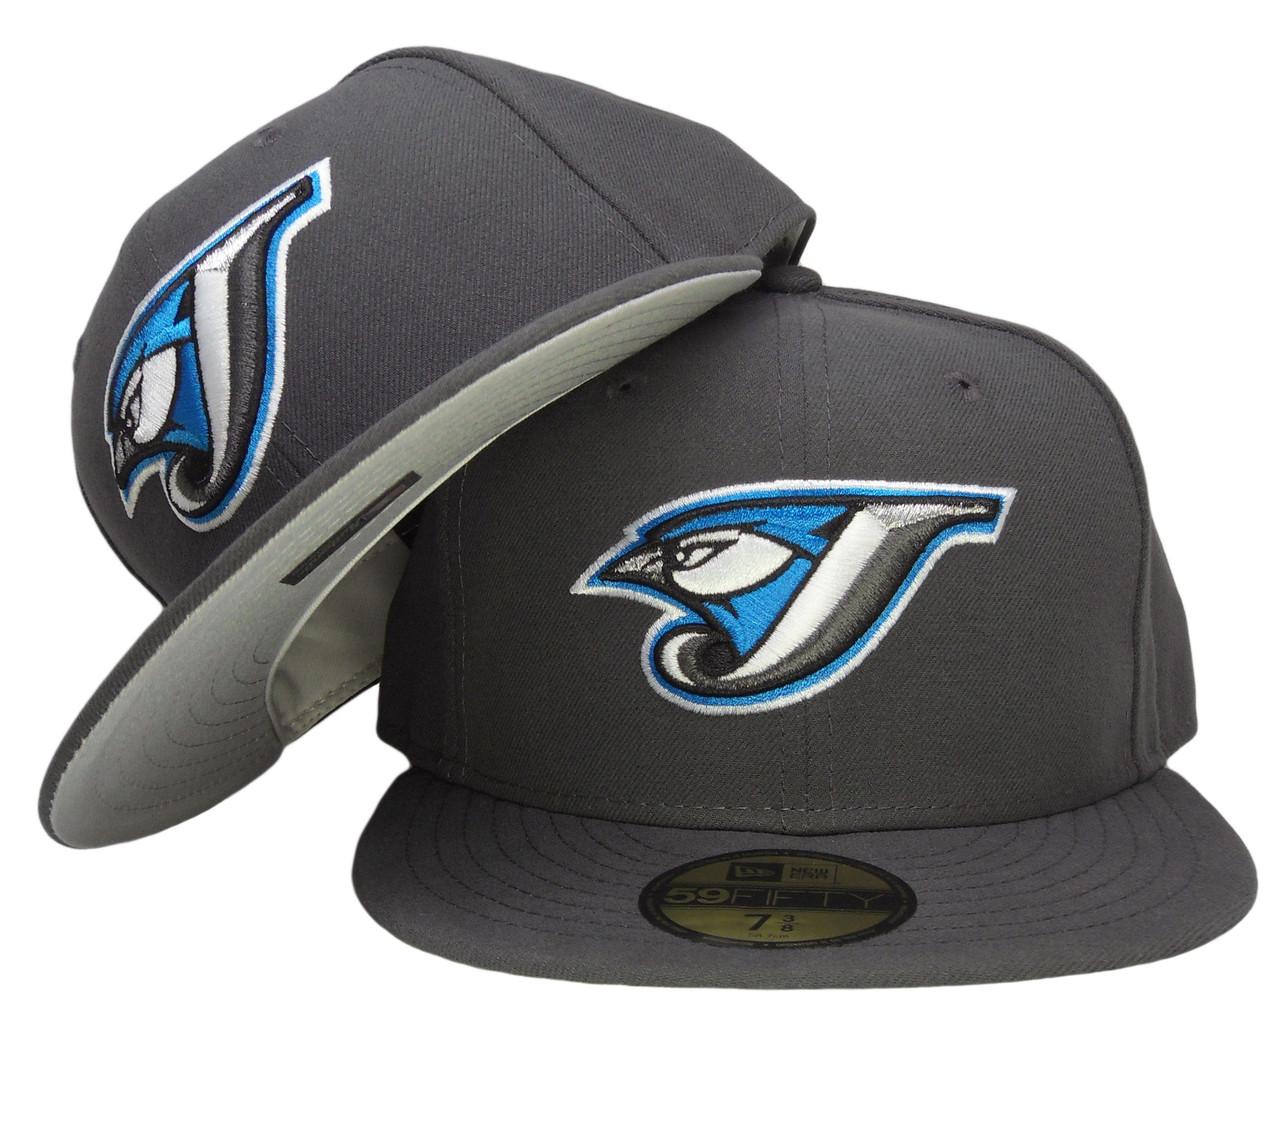 Toronto Blue Jays New Era Gray Bottom Fitted Hat - Graphite Gray ... 8ba693bf3c72